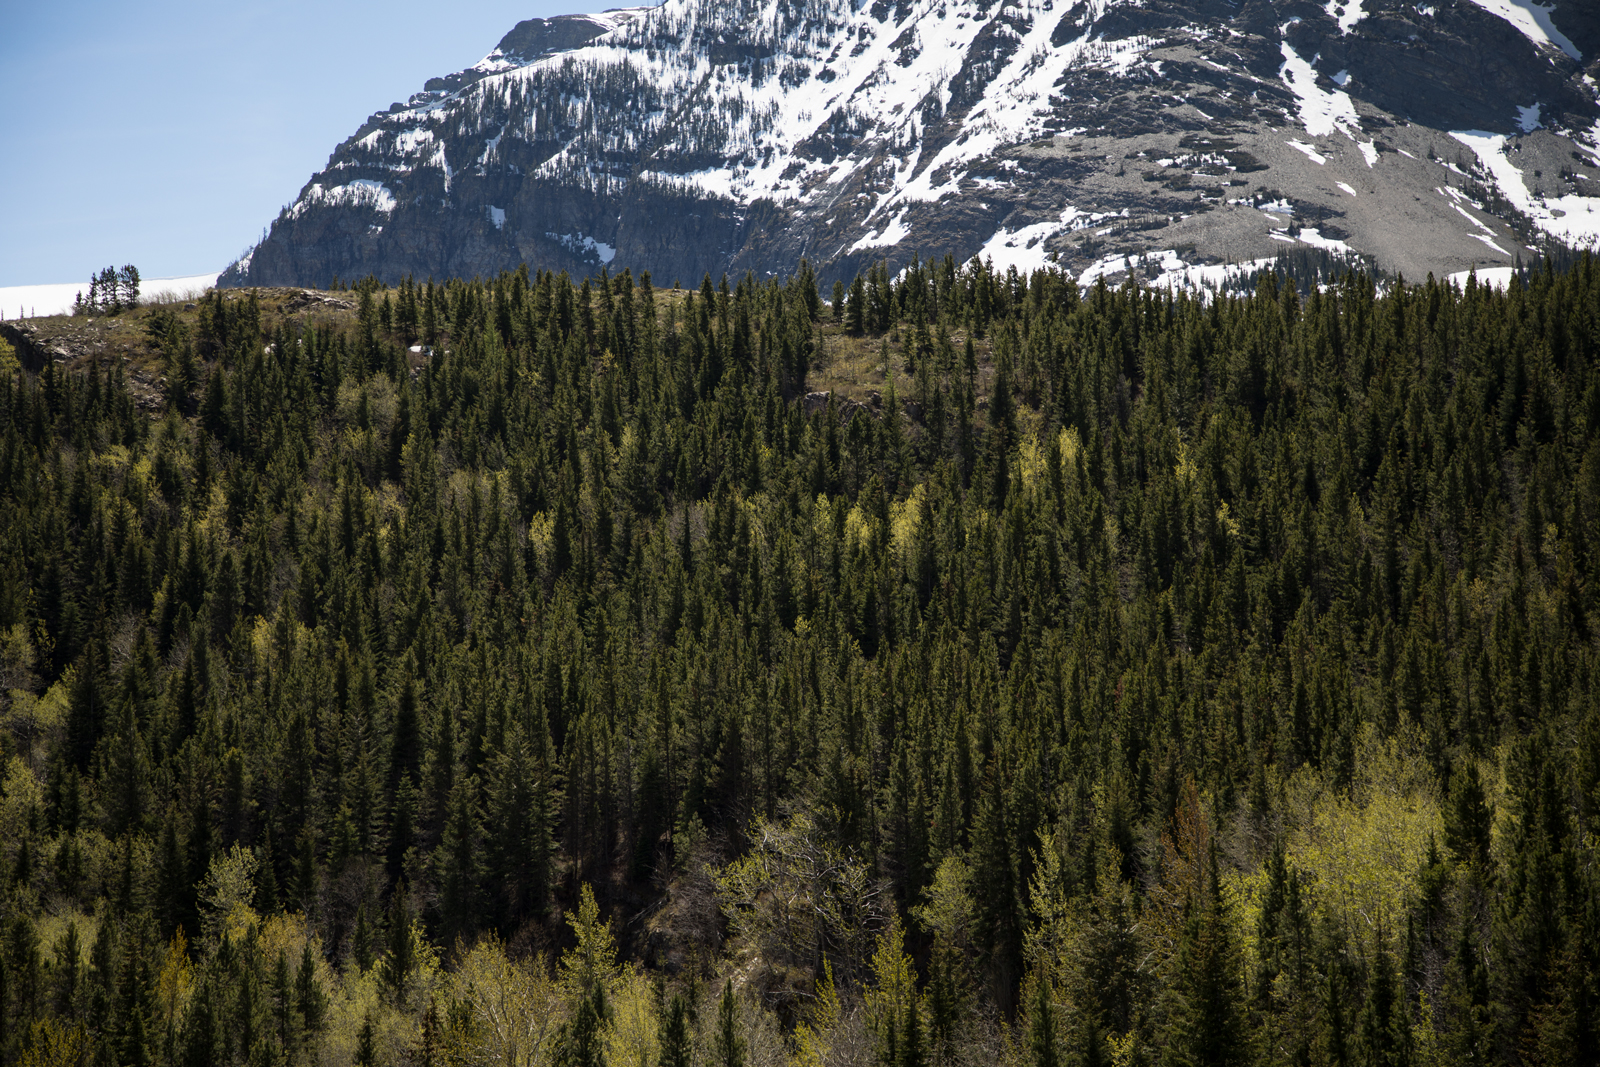 Trees-Mountain_web.jpg